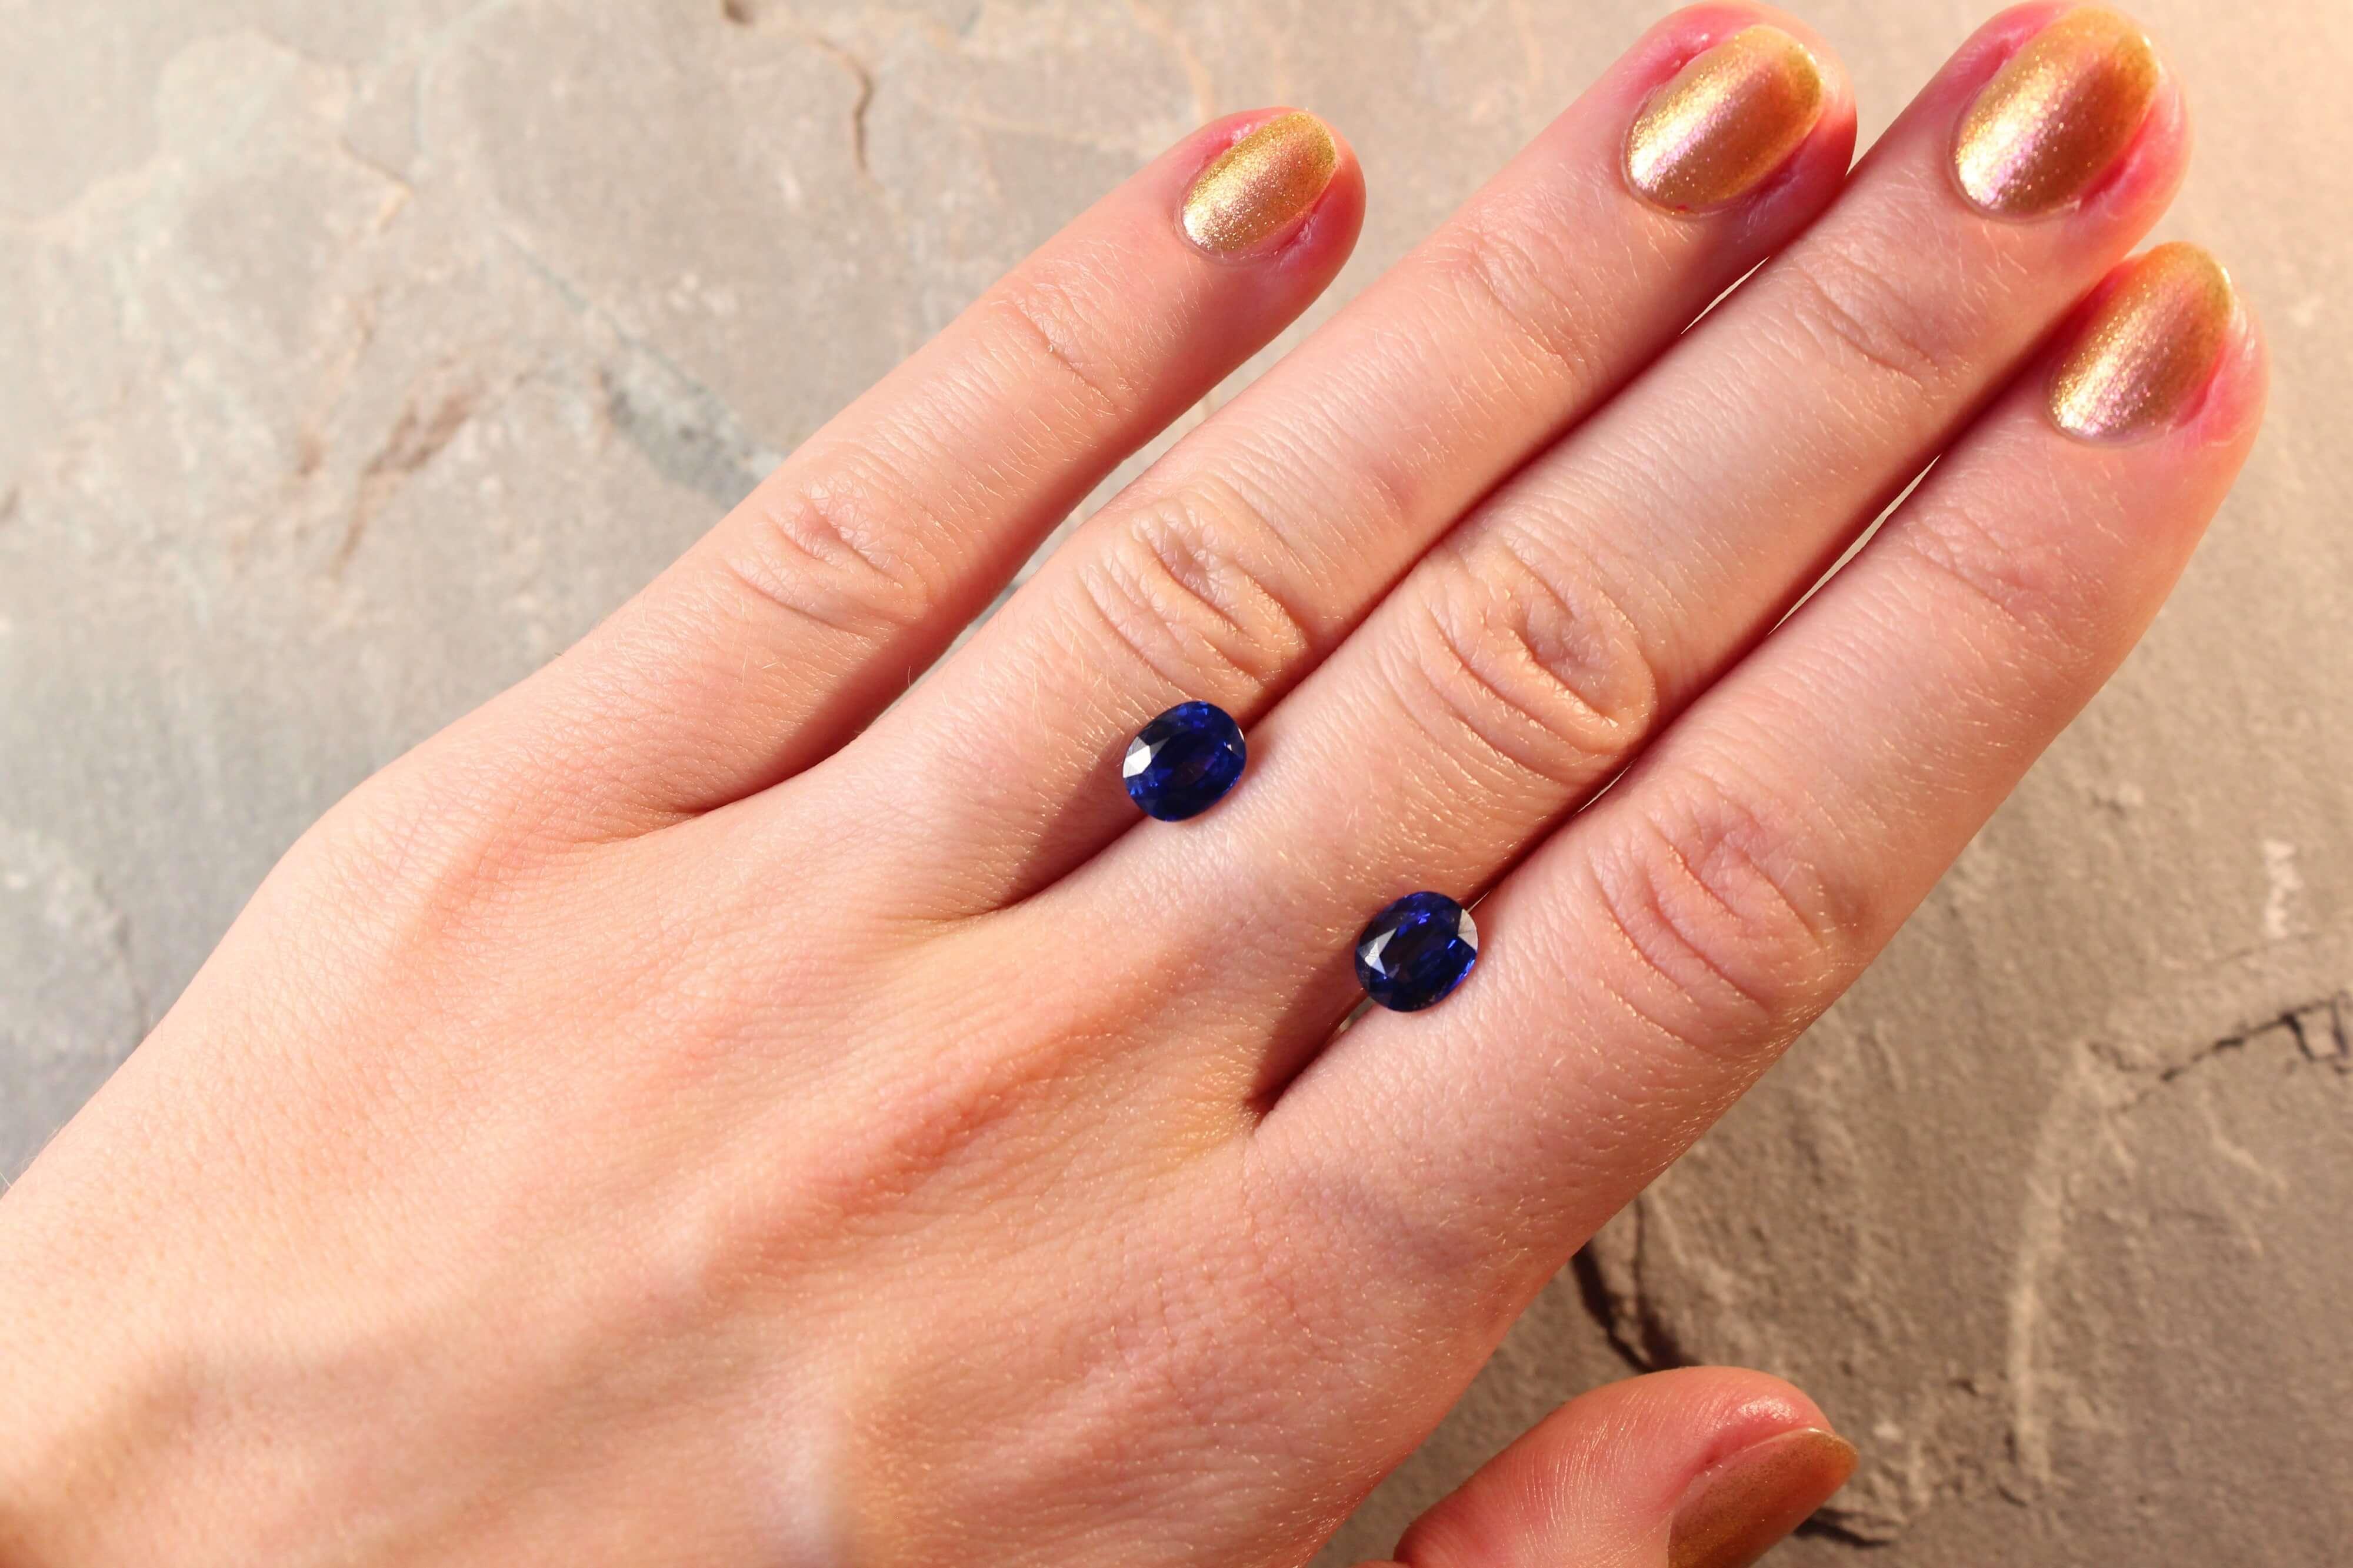 3.35 ct oval blue sapphire pair